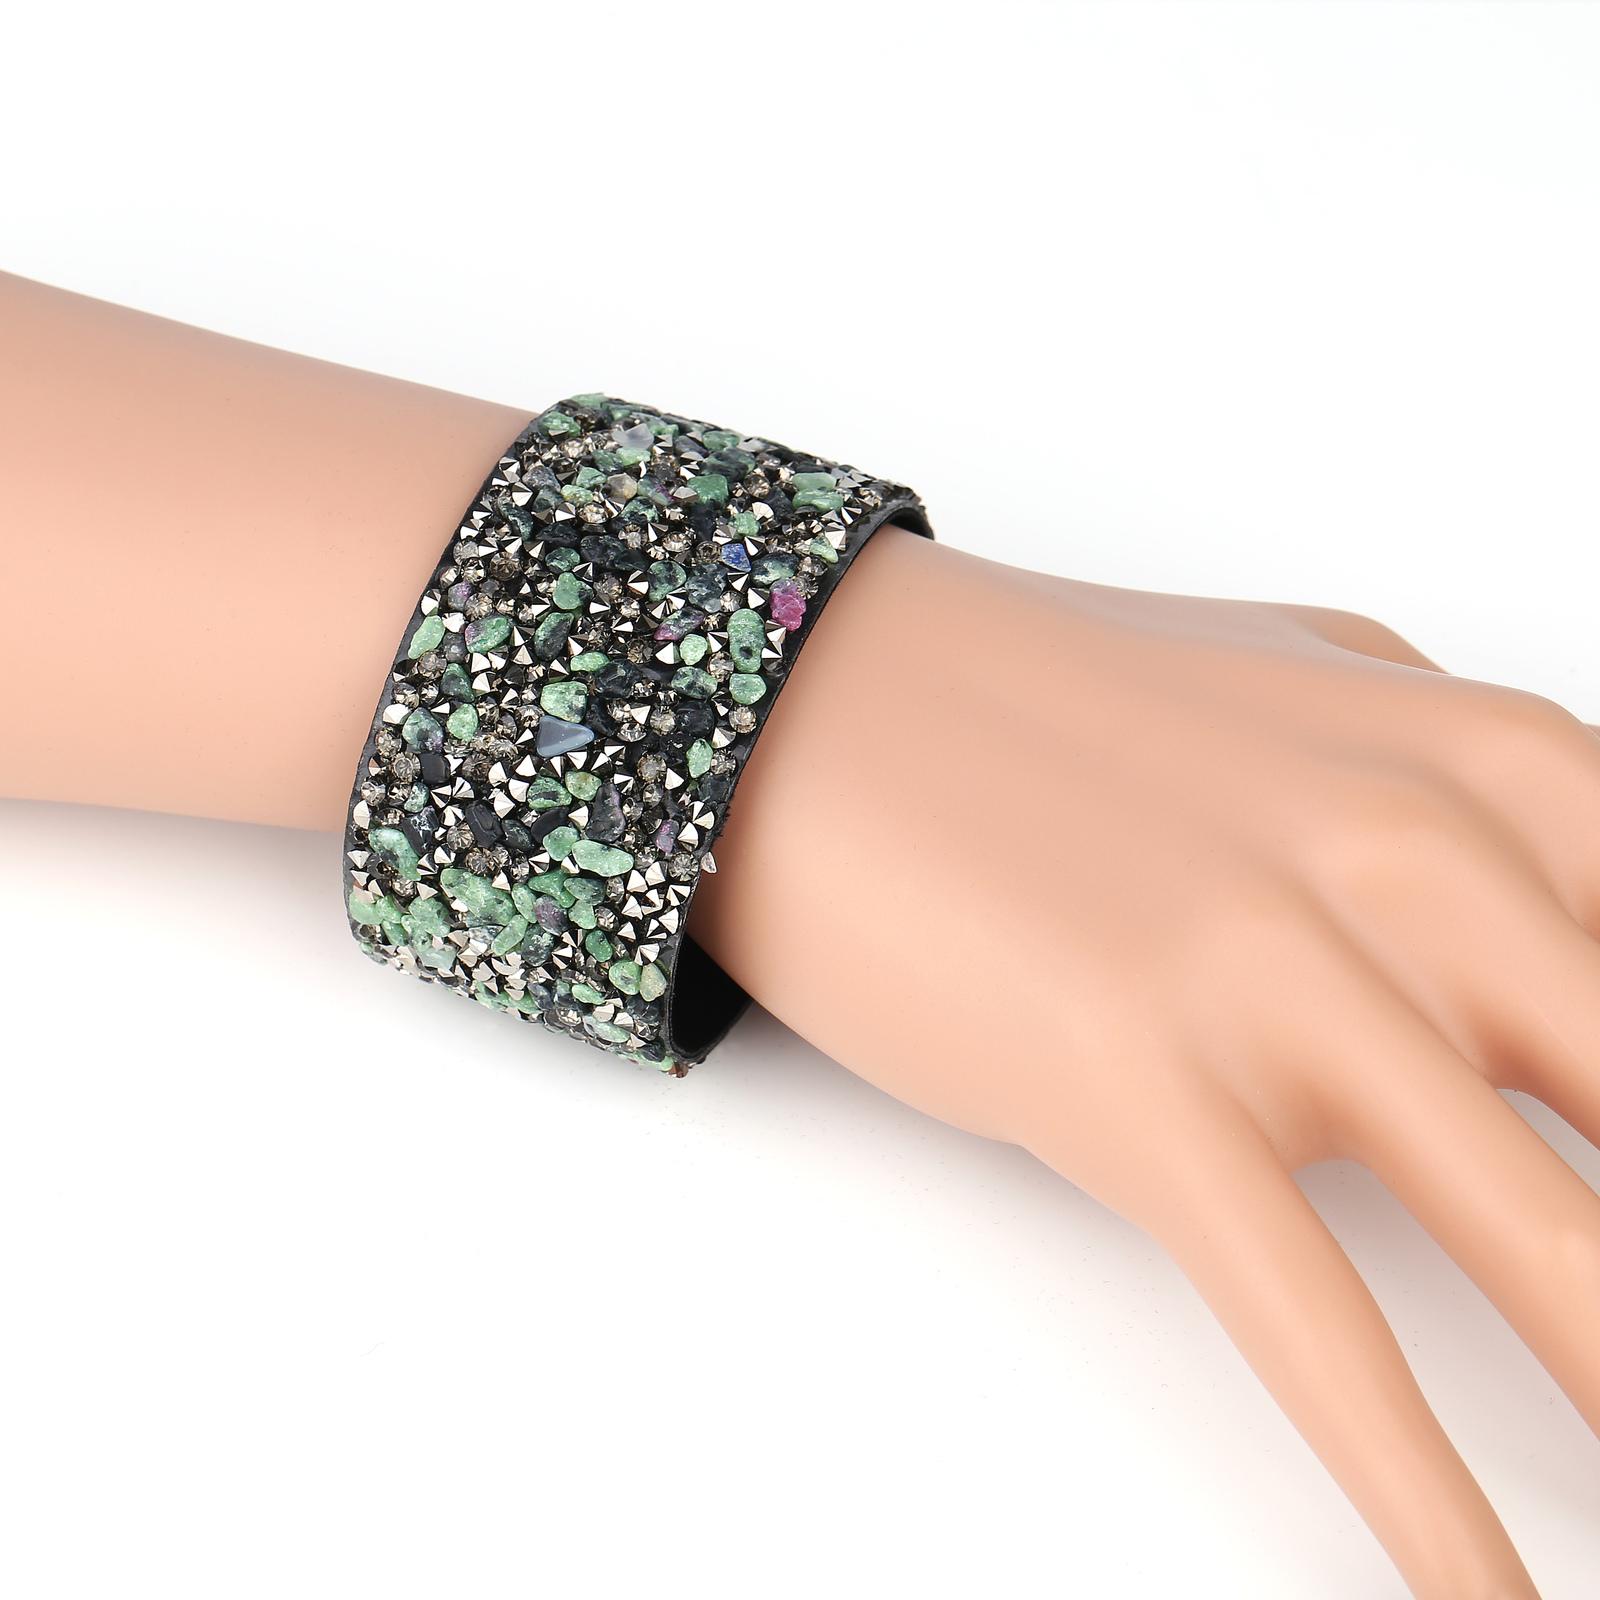 UNITED ELEGANCE Stylish Cuff Wristband With Stones & Swarovski Style Crystals